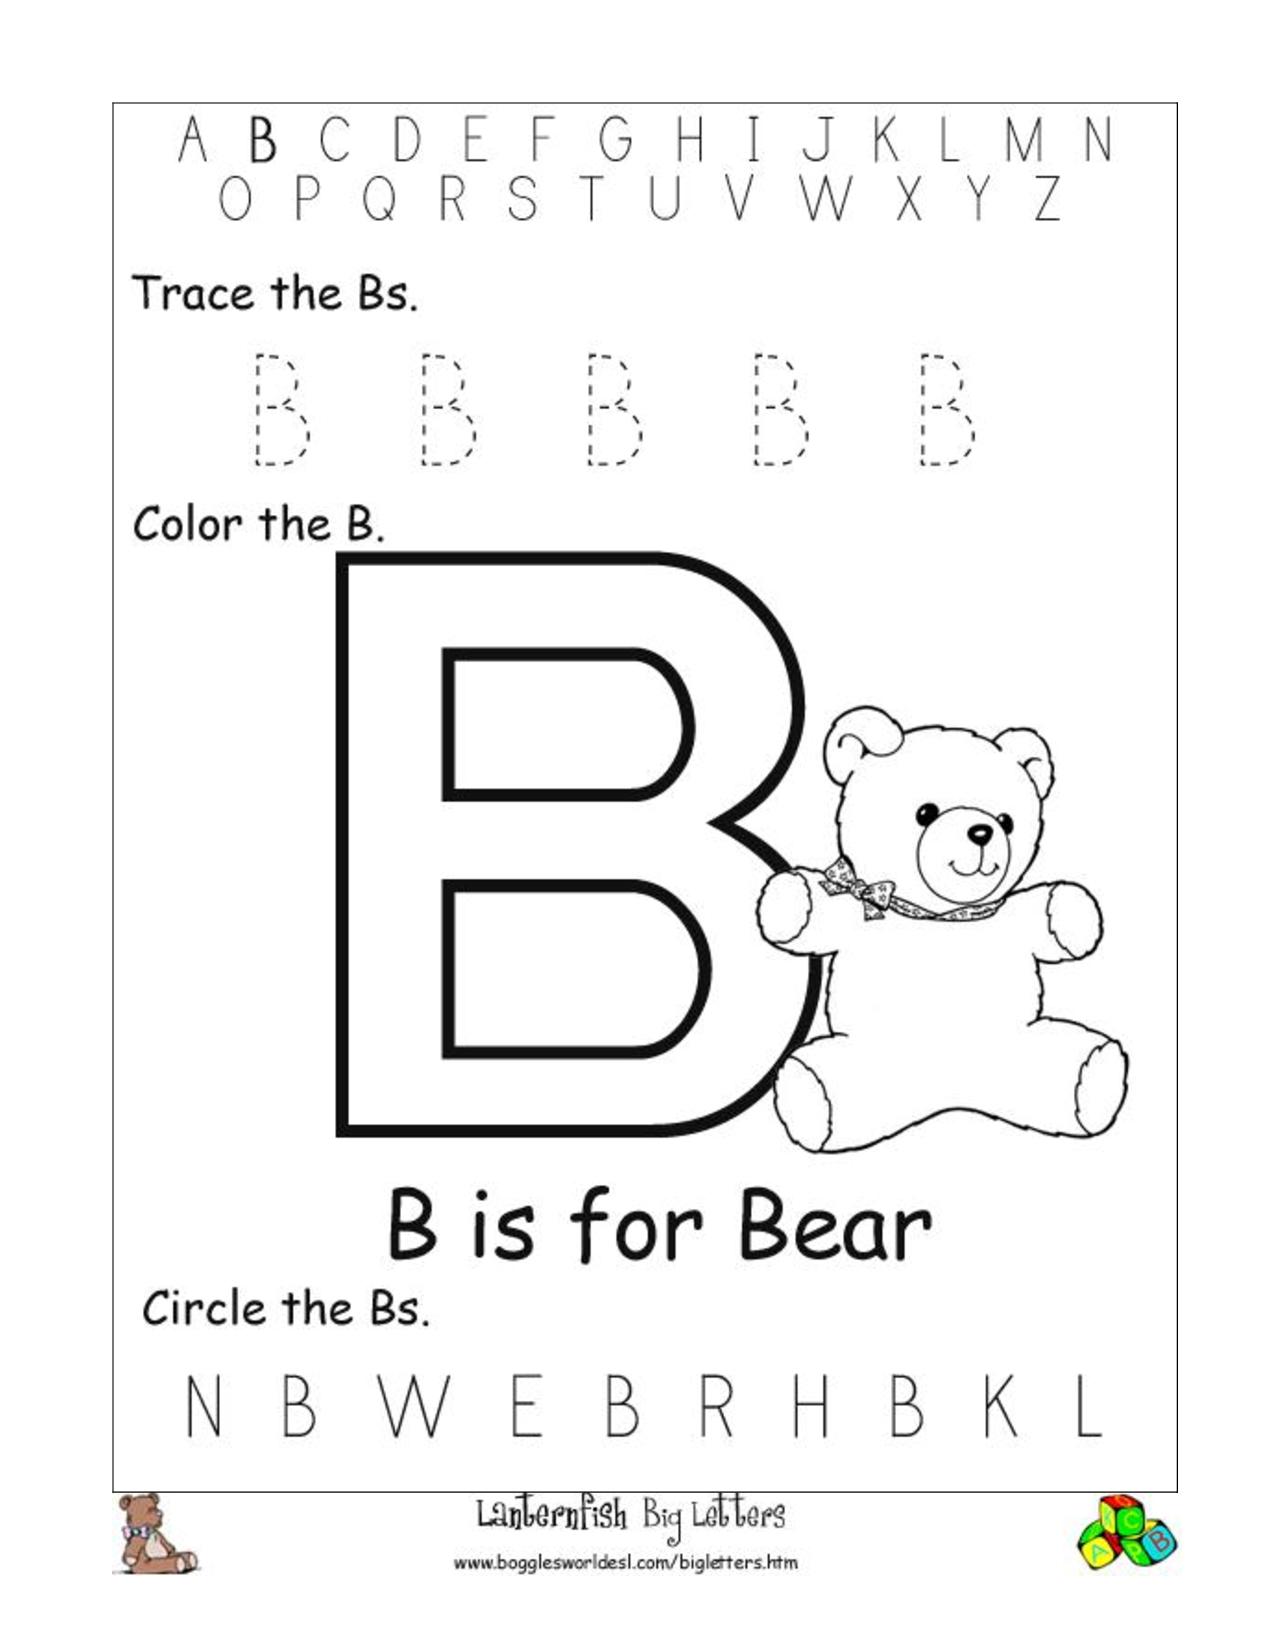 Alphabet Worksheet Big Letter B Doc | Preschool- Alphabet regarding Alphabet Worksheets Letter B